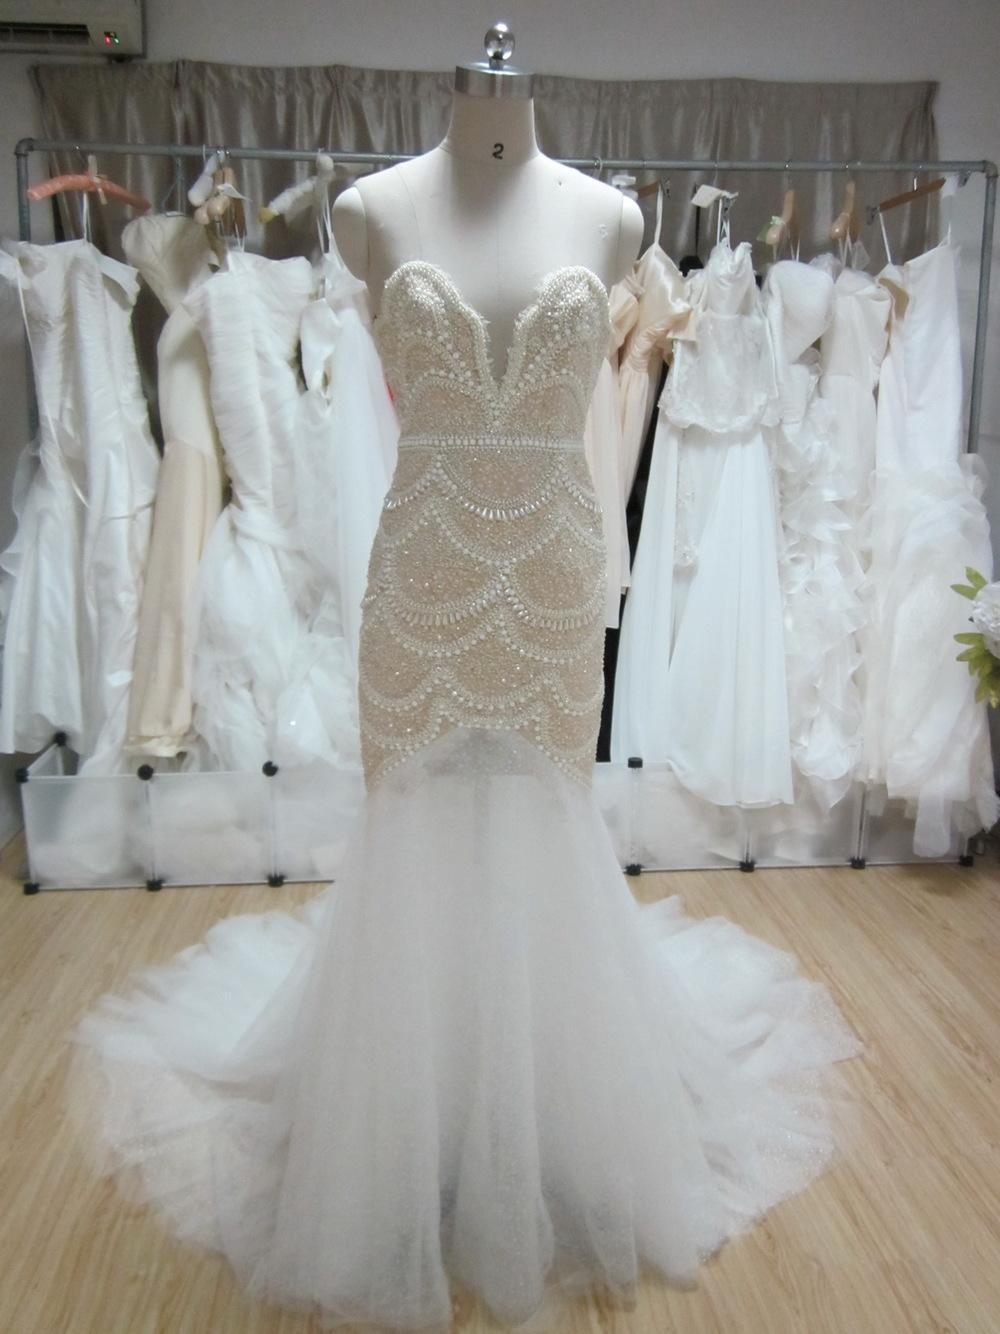 J Aton Couture Bridesmaid Dress Choice Image - Braidsmaid Dress ...